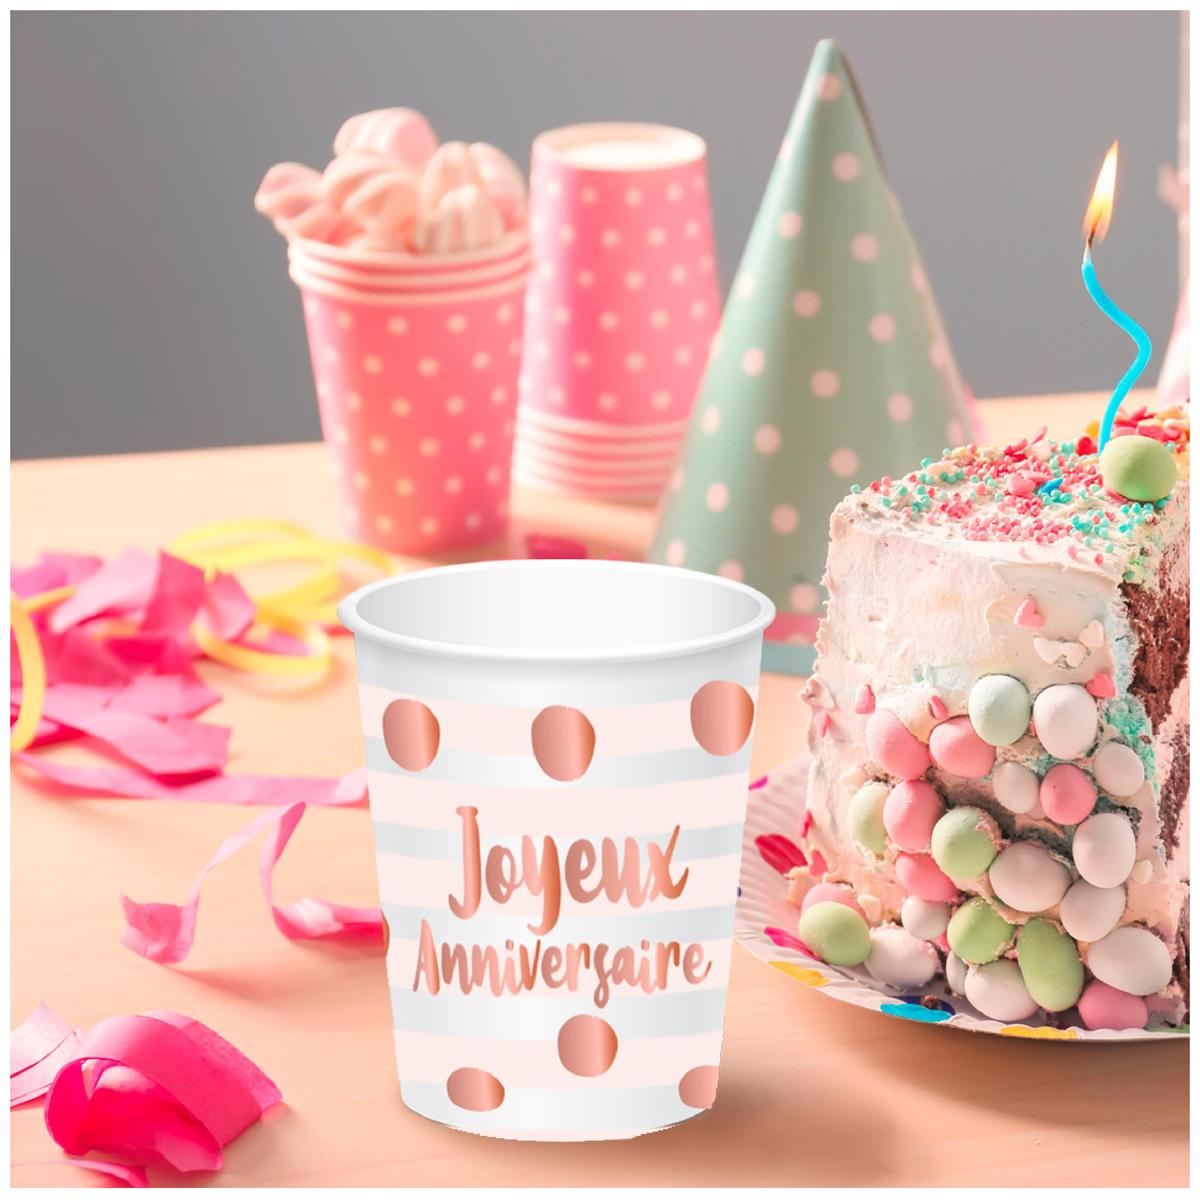 6 gobelets carton \'Joyeux Anniversaire\' blanc rosé (blush) - 85x75 mm (25 cl) - [A0762]